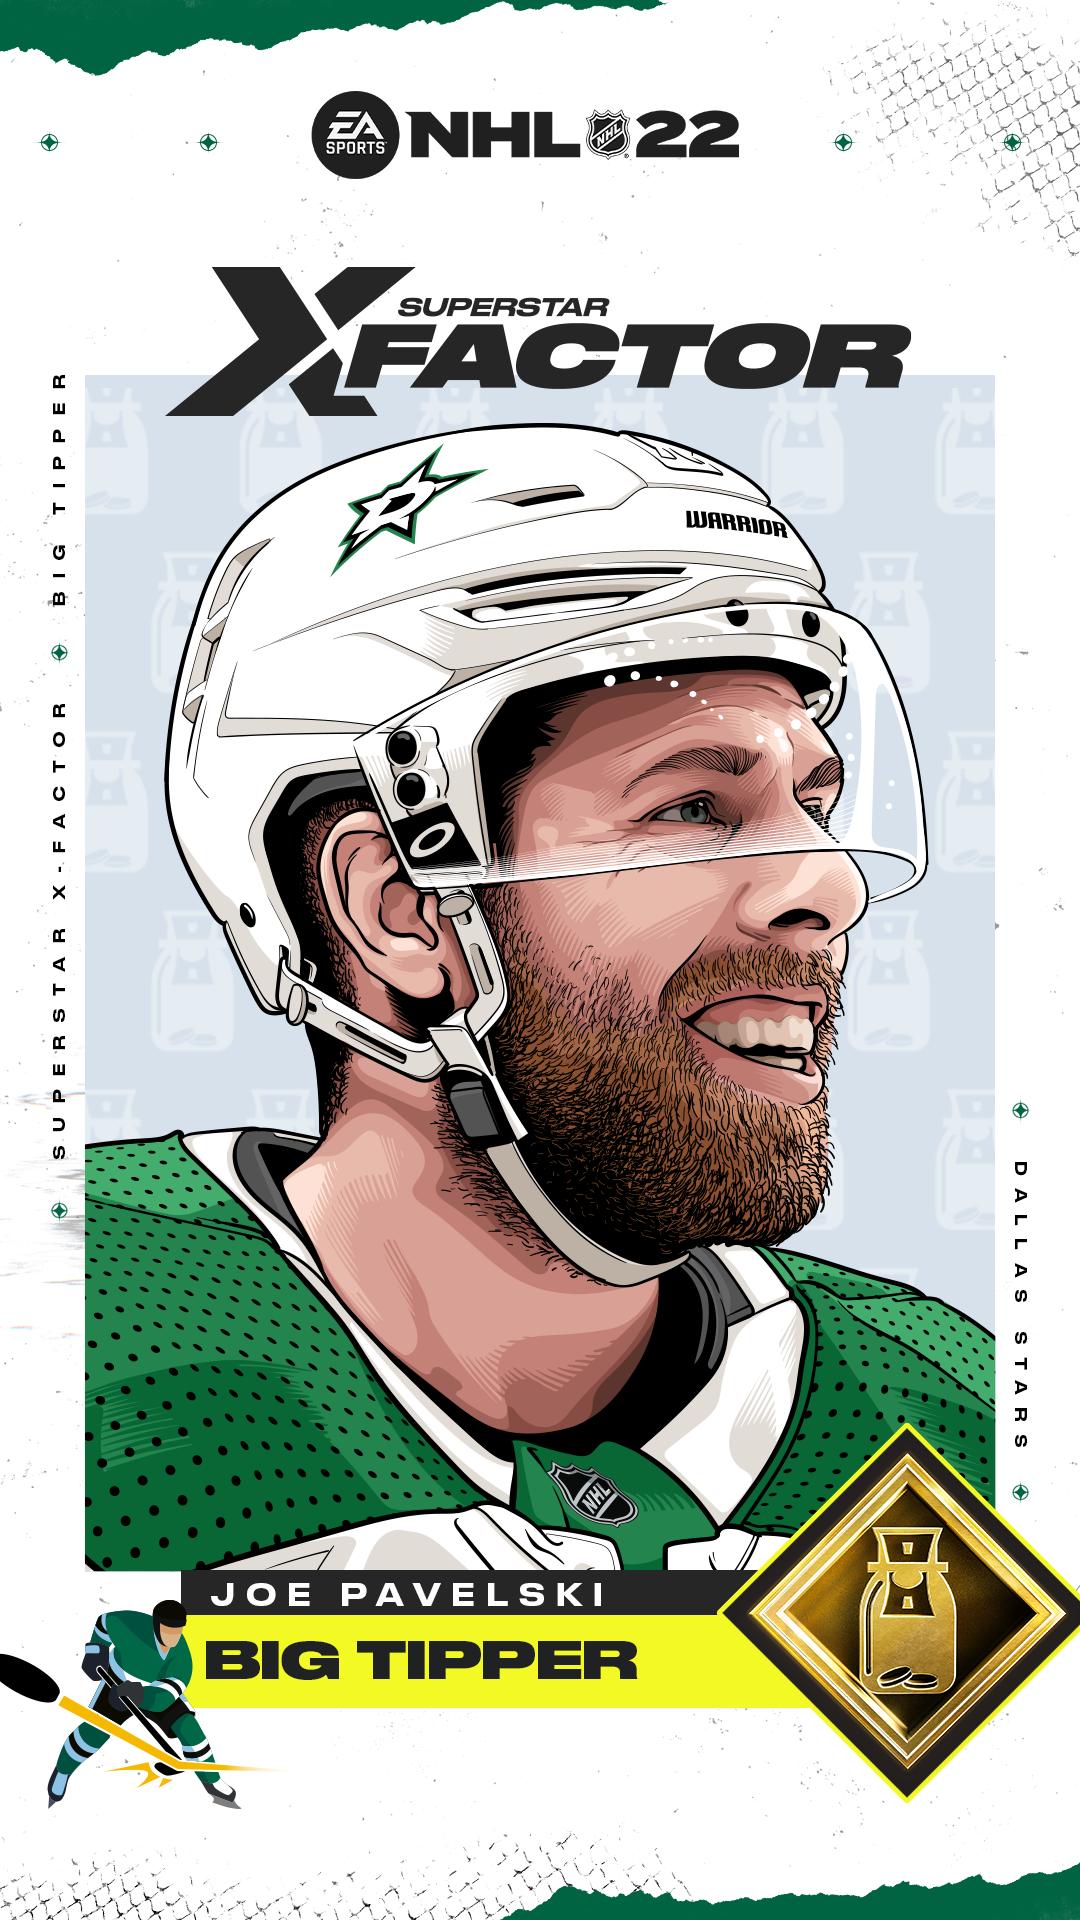 NHL22_XFactor_JoePavelski_9x16